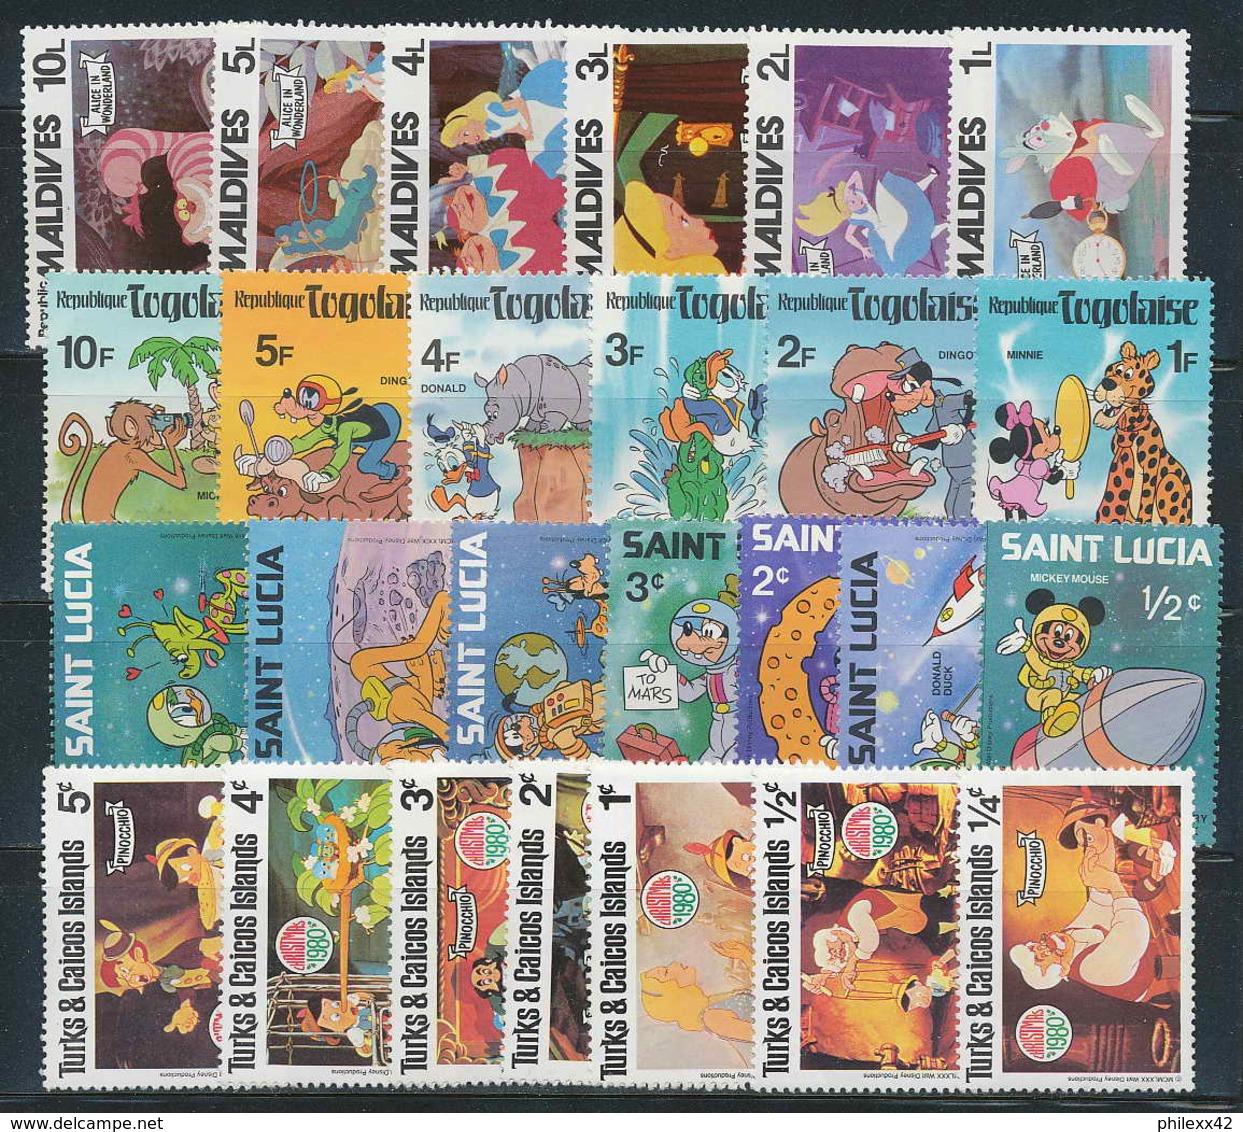 1000 - DISNEY 4 BONNES SérieS NEUFS ** PARFAIT ETAT MNH ** - Disney